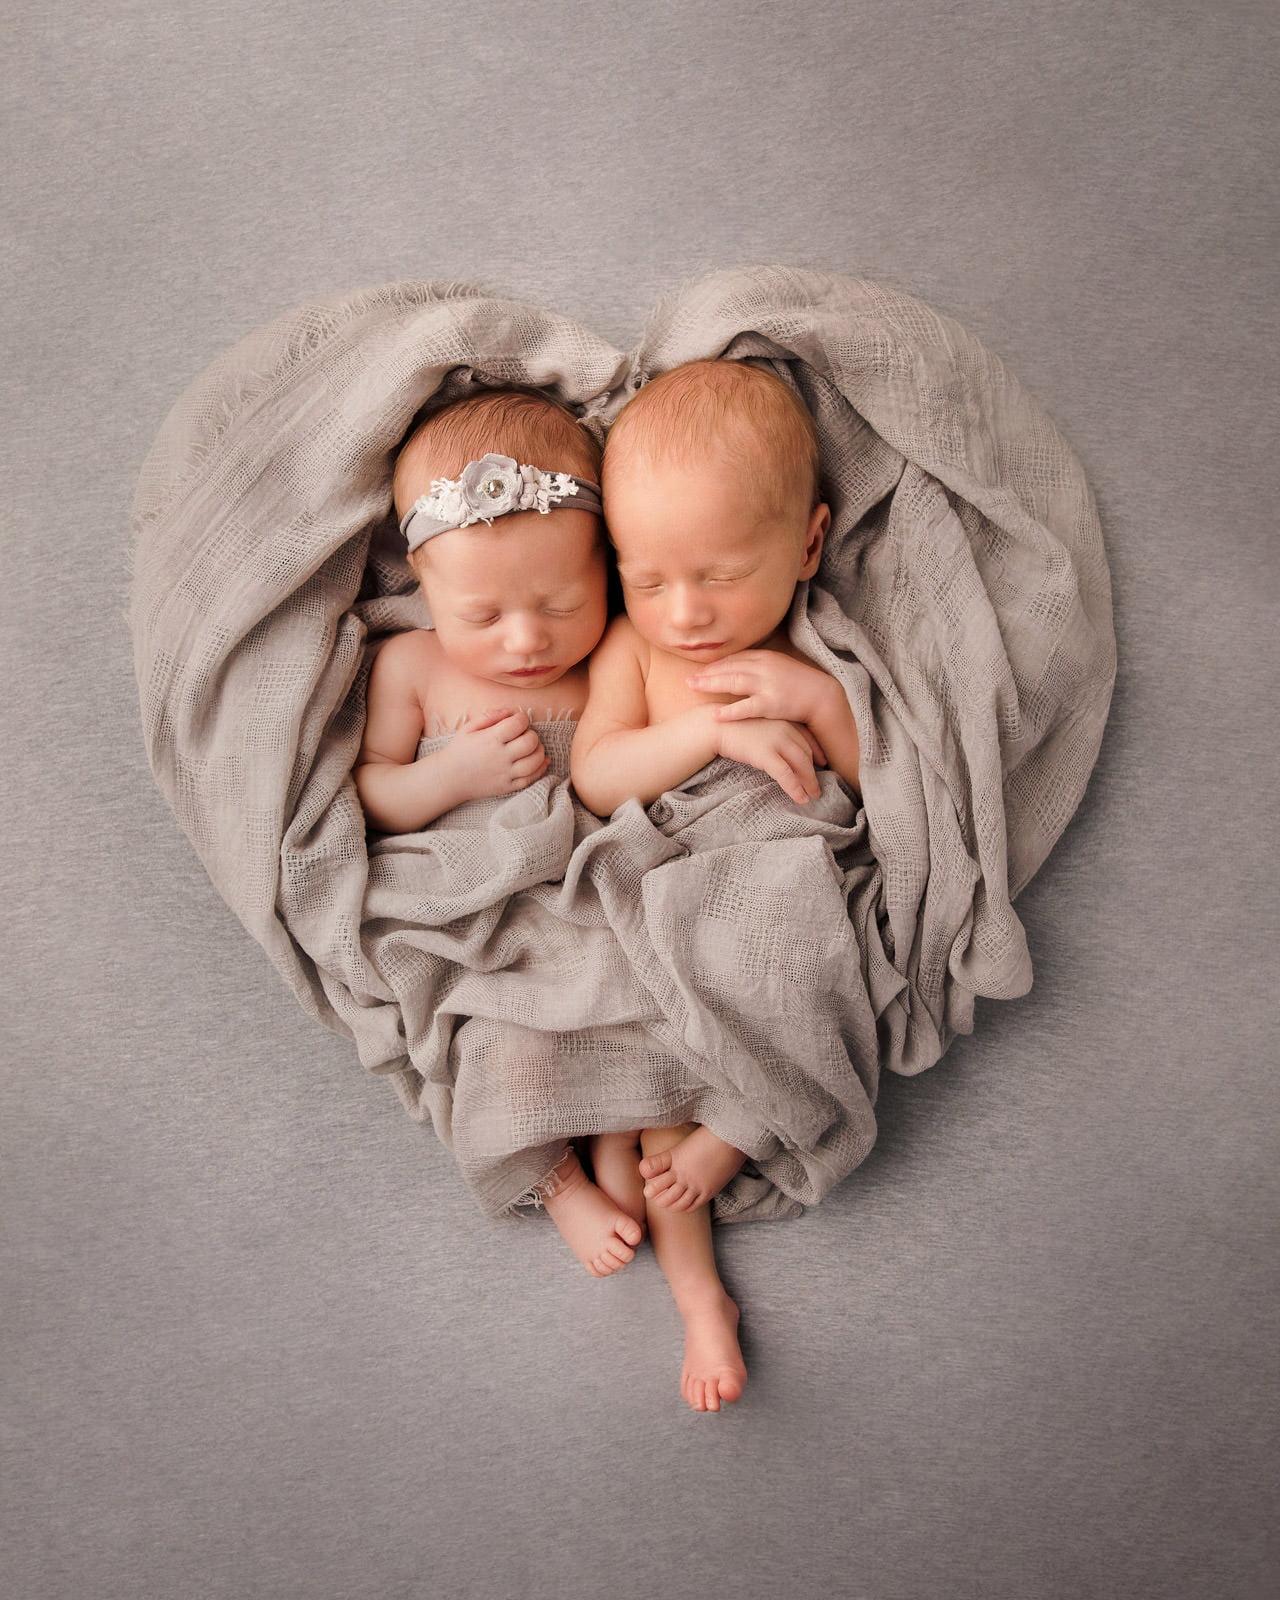 Adorable Newborn Rainbow Twins 1